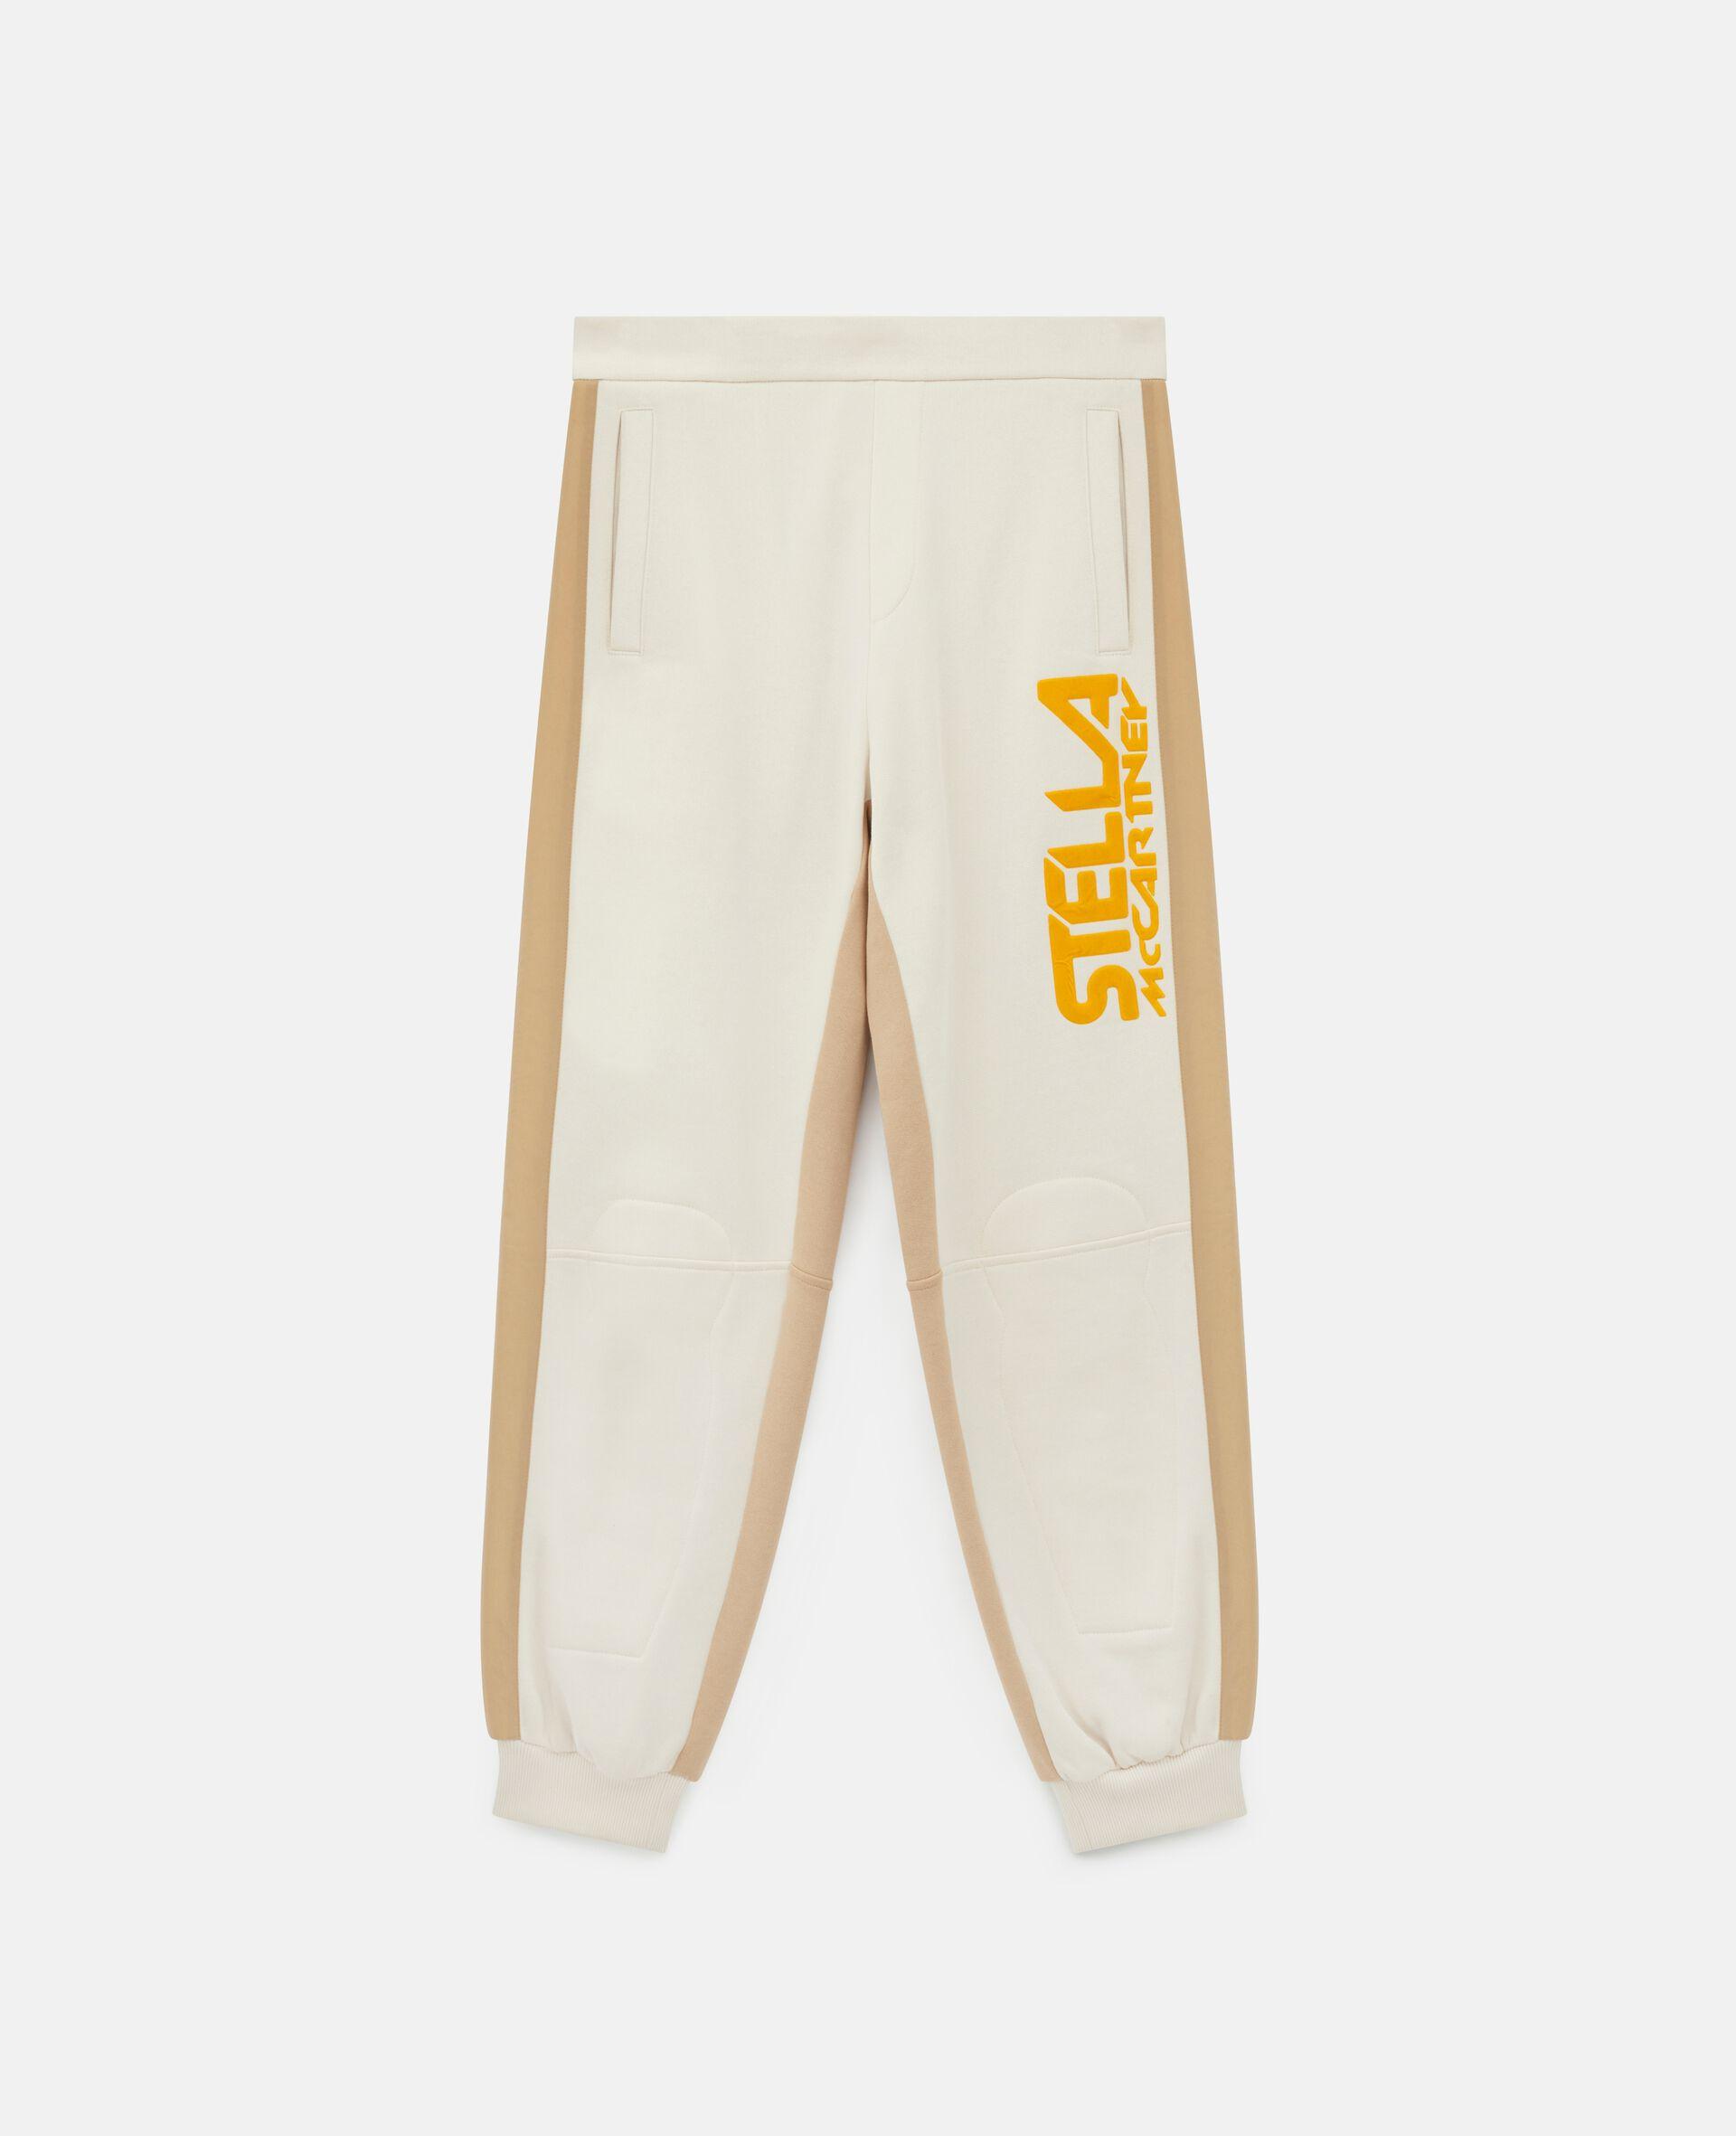 Stella McCartney Logo Trousers -White-large image number 0